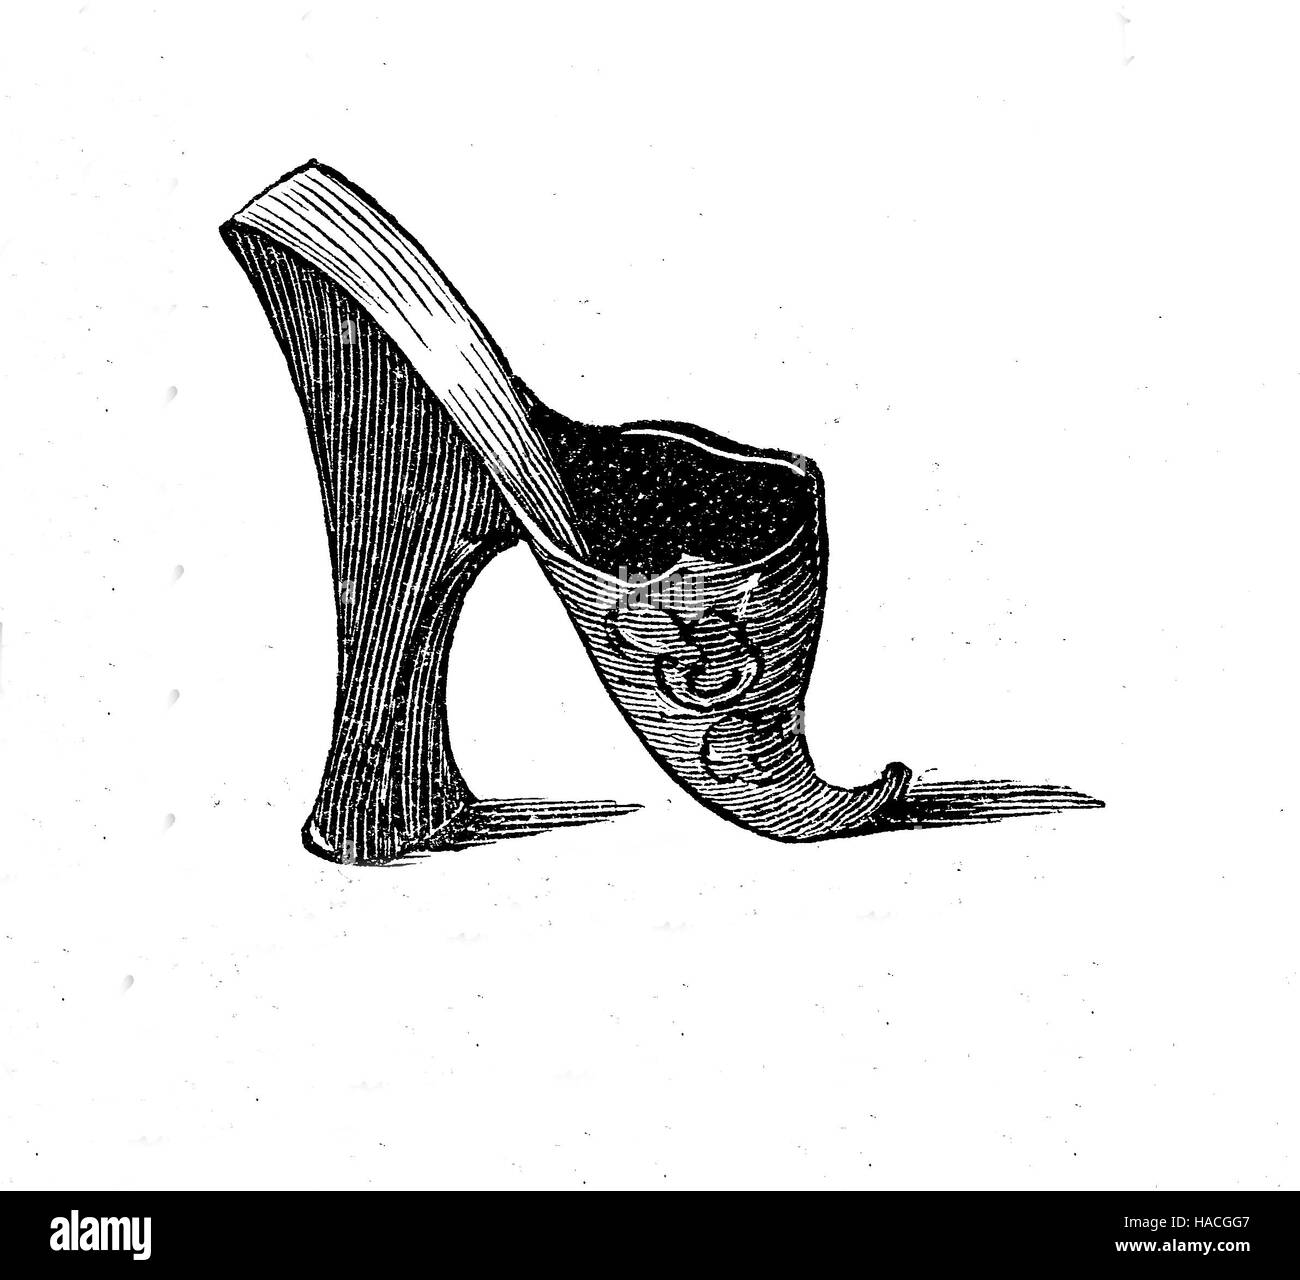 Schuhe, Mode vergangener Zeiten. Pantoffel aus Seitengasse, 18. Jahrhundert, historische Illustration, Holzschnitt Stockbild